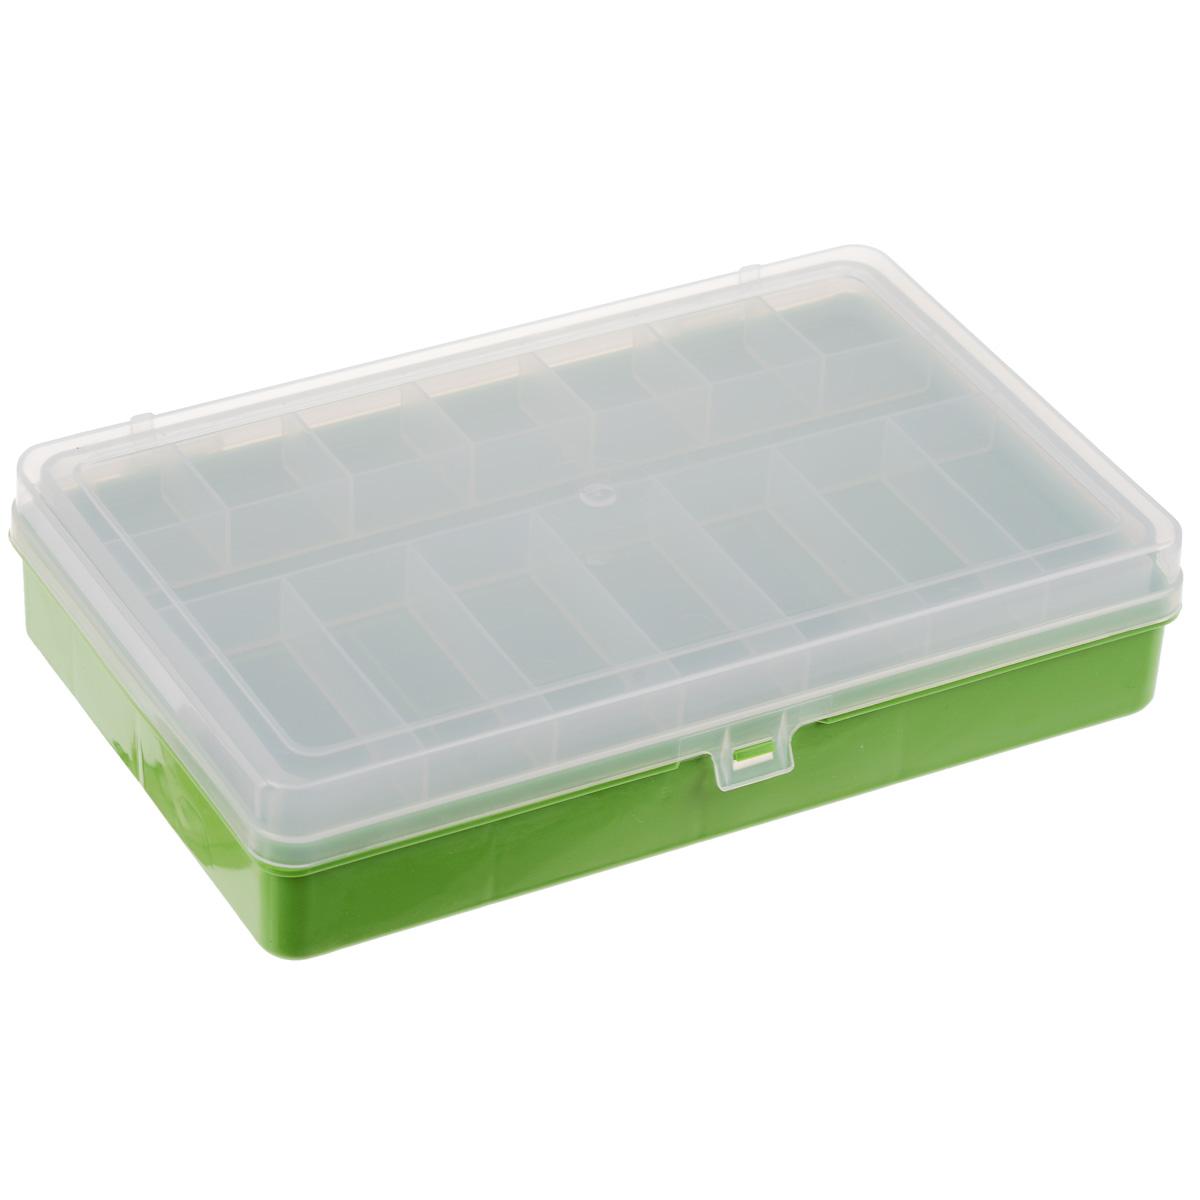 цена на Органайзер для мелочей, 2-х ярусный, 3 тип, 23,5 см х 14,5 см х 5 см, цвет: зеленый, прозрачный